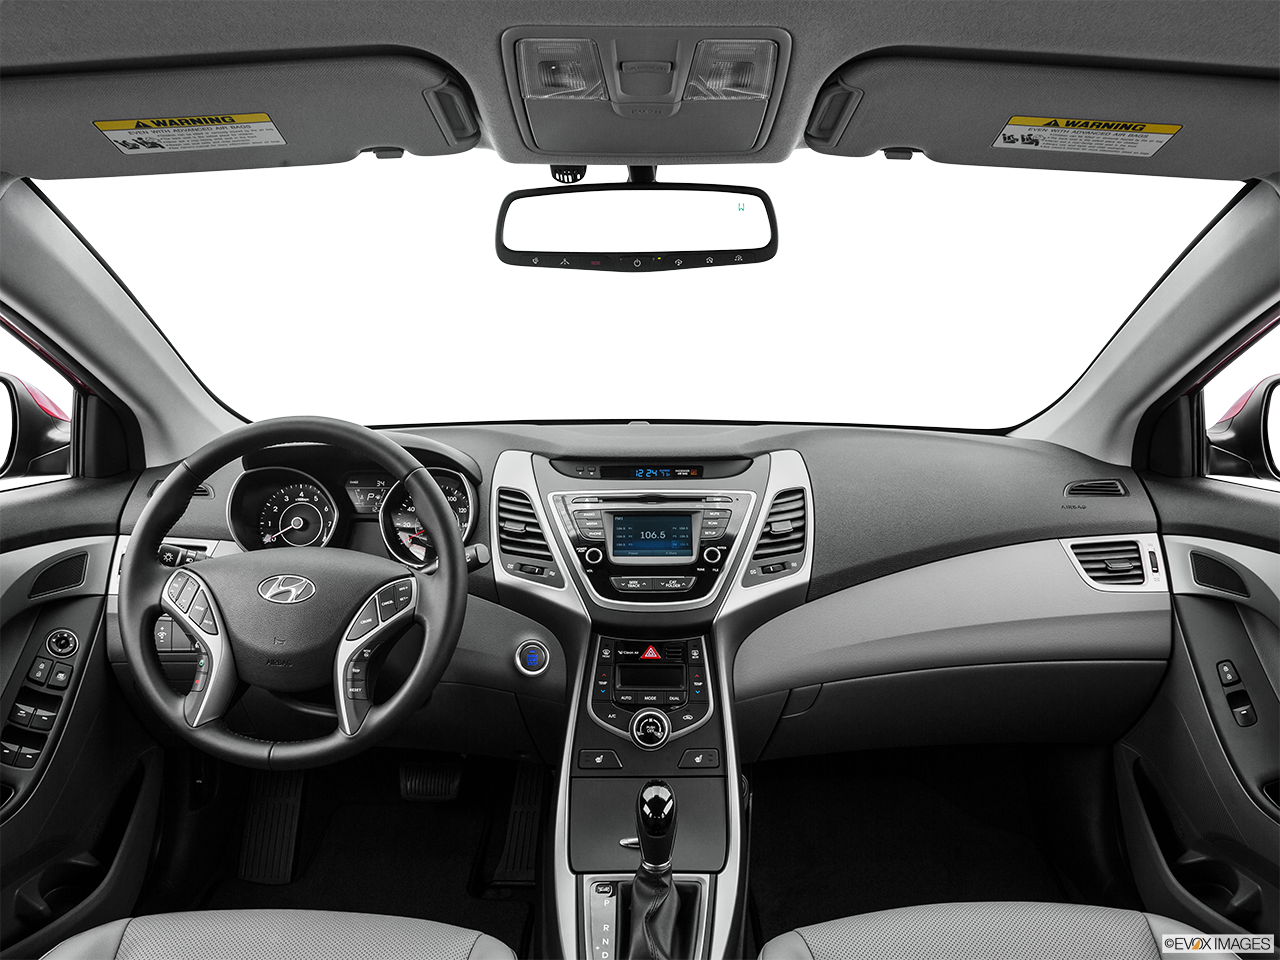 hyundai elantra 2016 black. interior view of 2016 hyundai elantra in tracy black